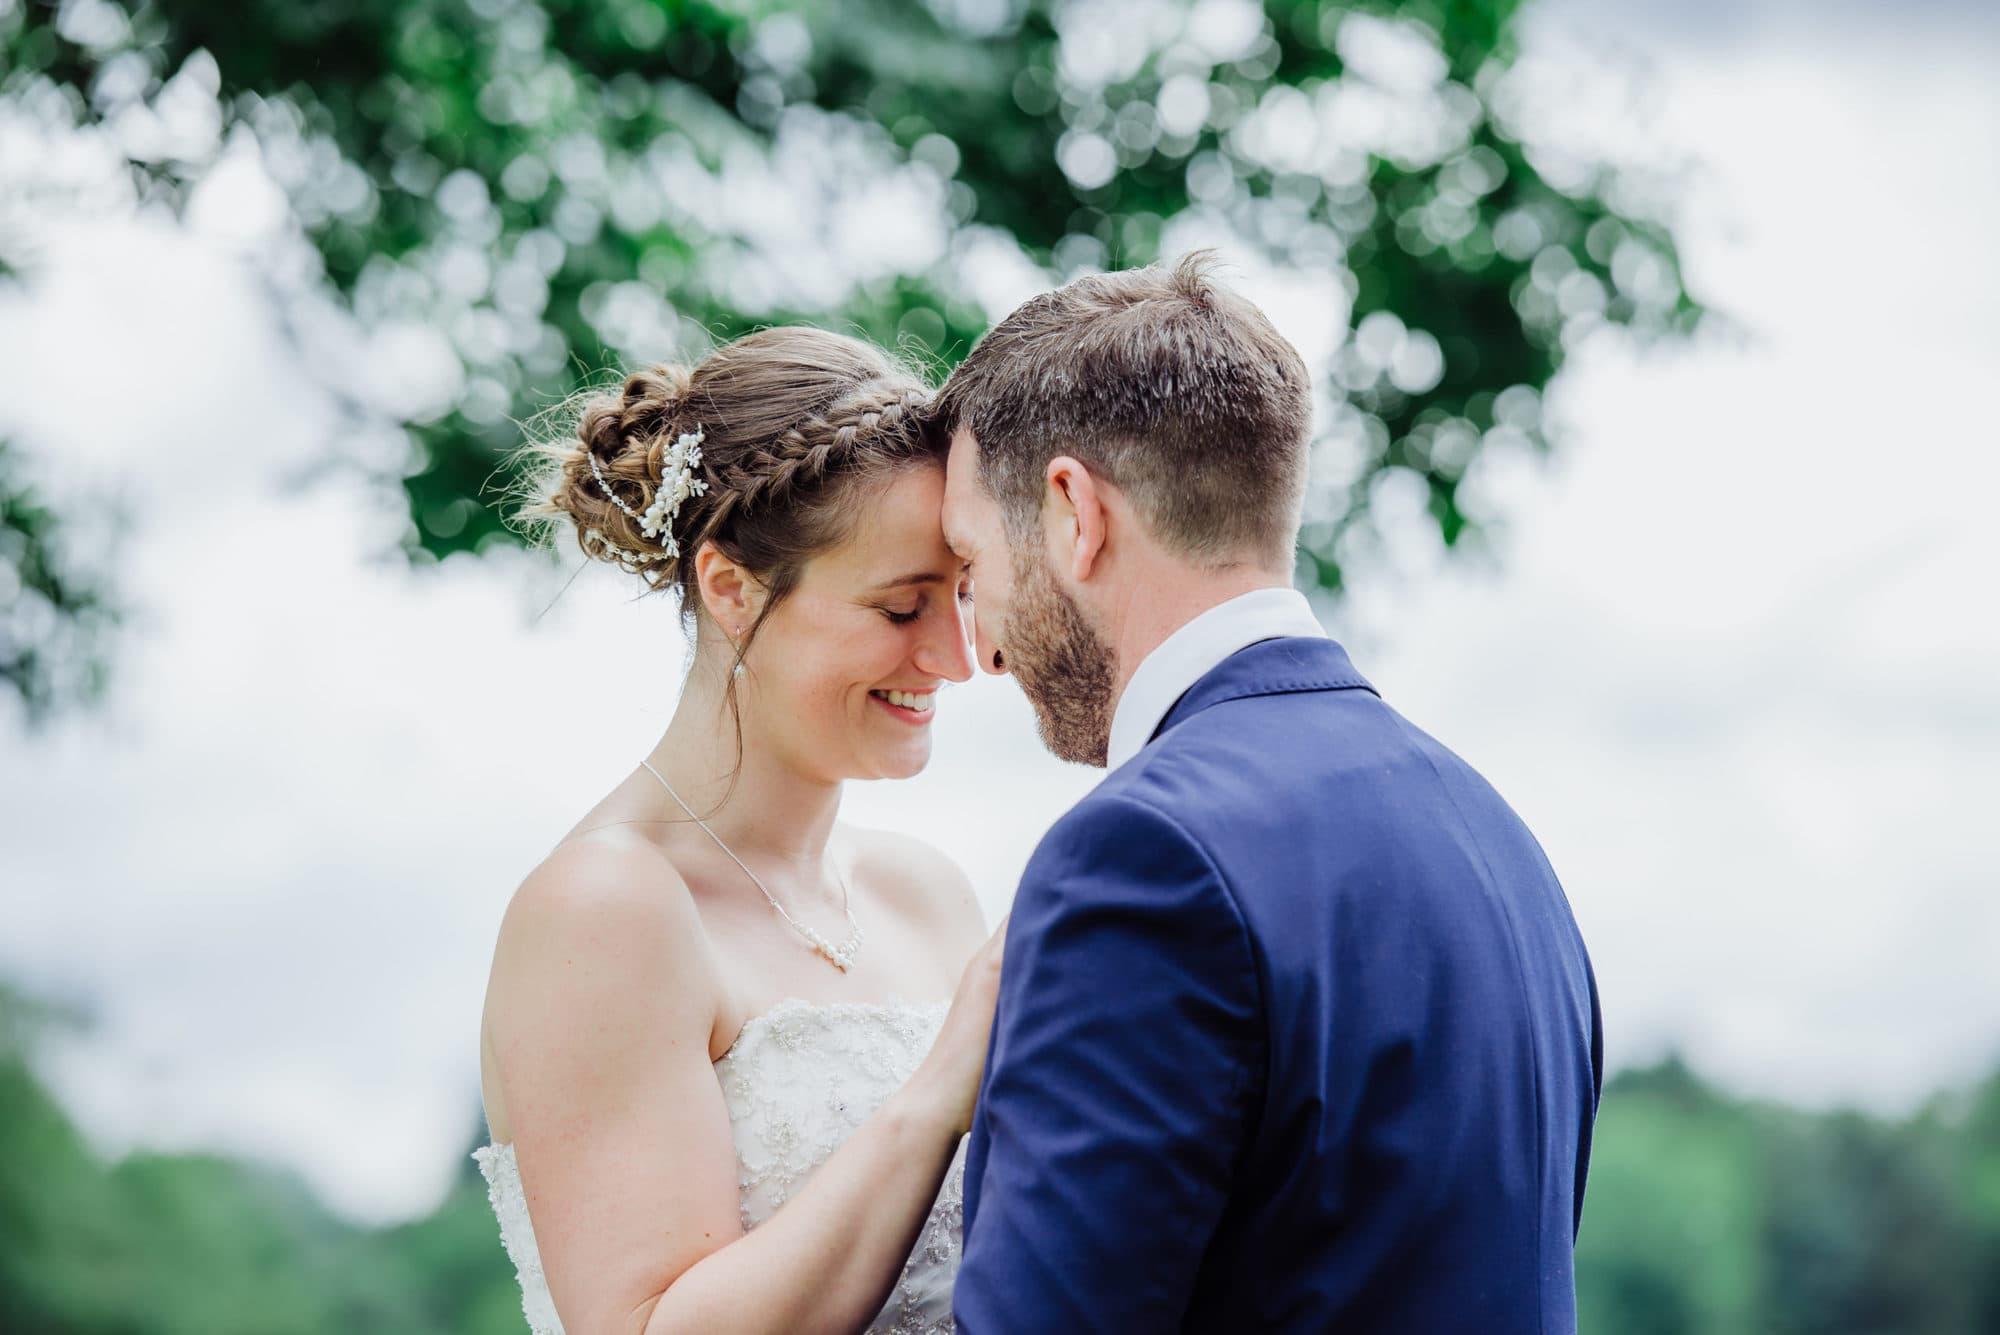 wedding photo of bride and groom head to head